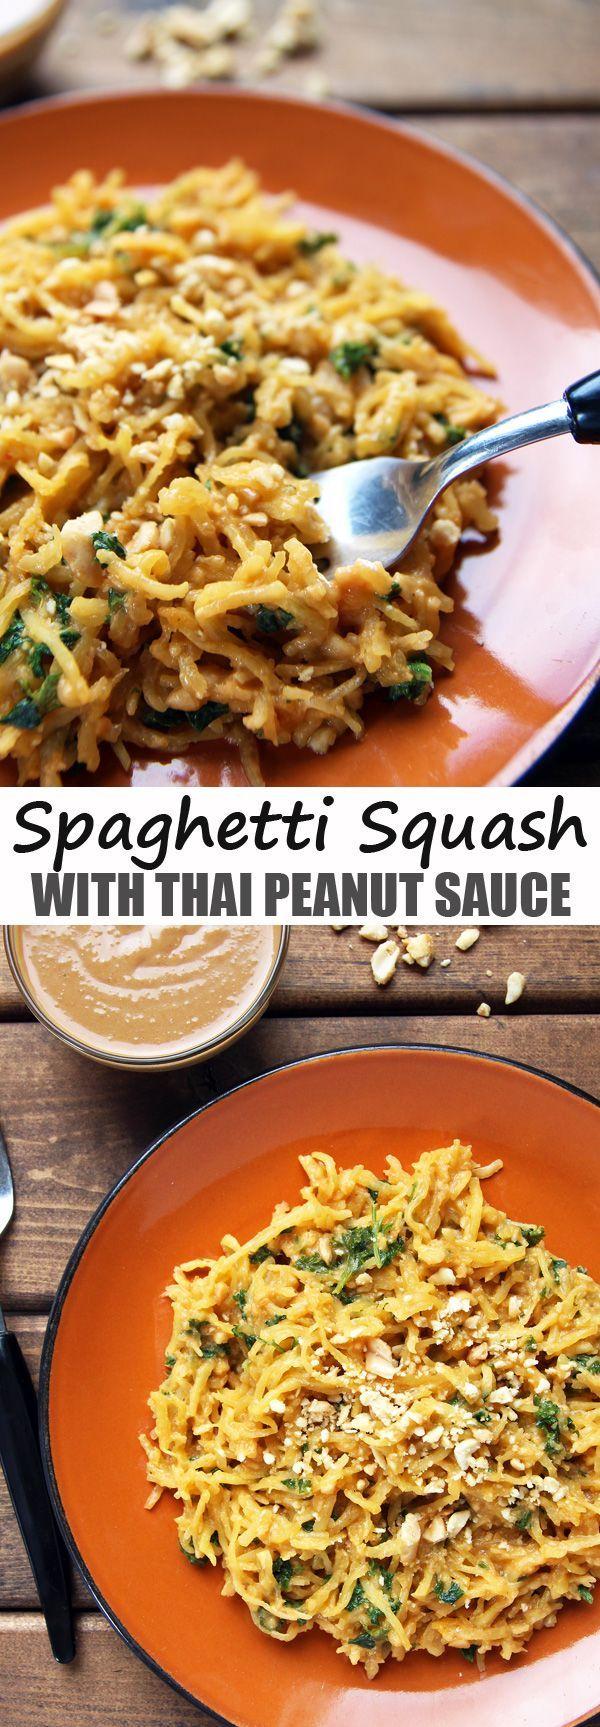 sub with on plan sweetner - Spaghetti Squash with Thai Peanut Sauce